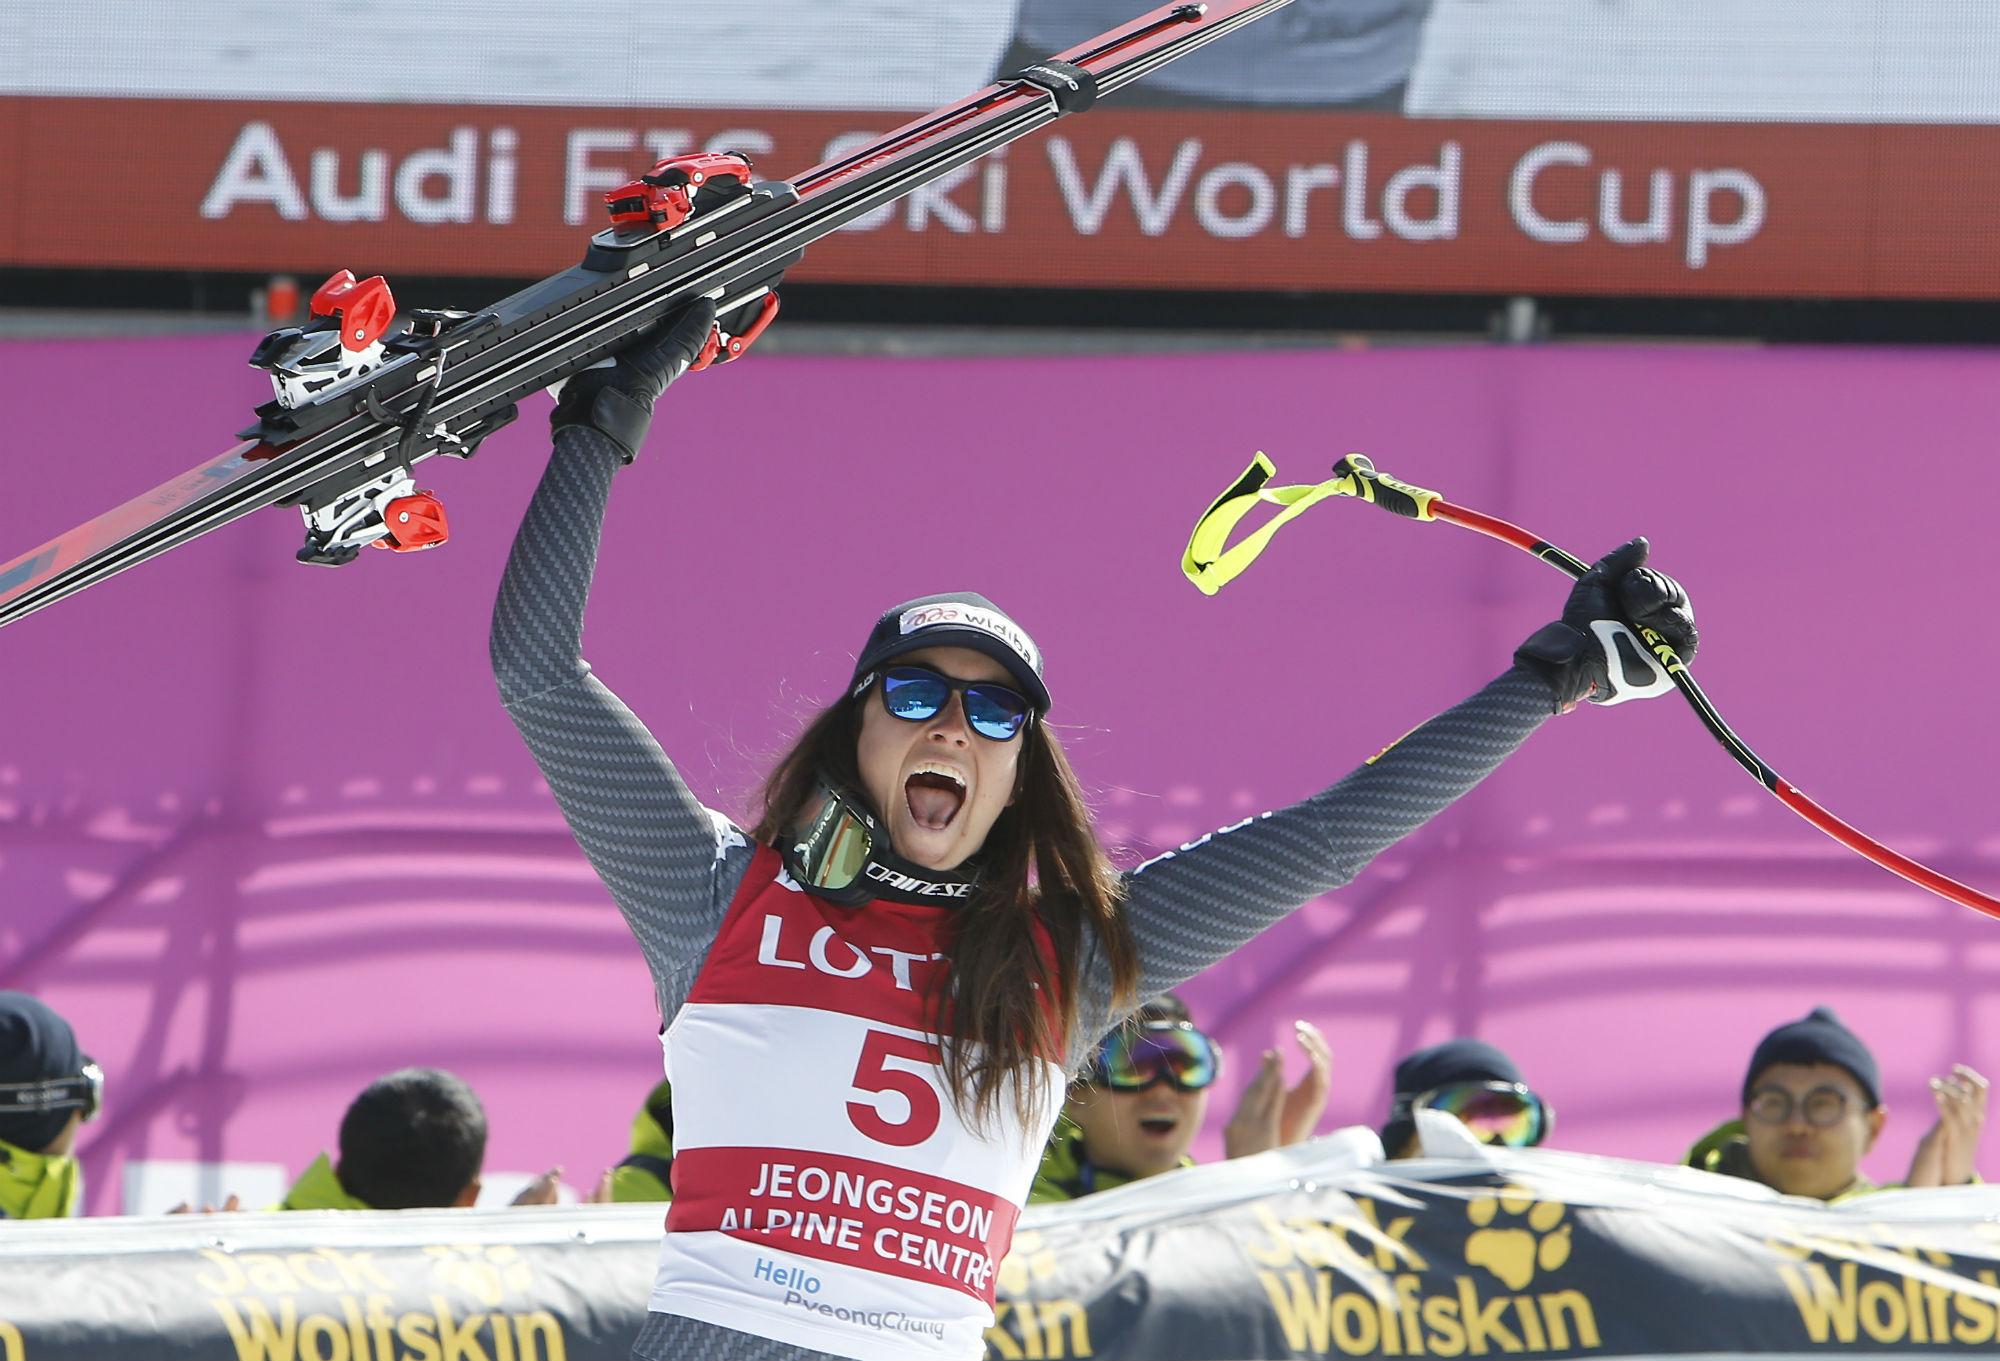 Sofia Goggia in trionfo a Jeongseon (@Zoom agence)